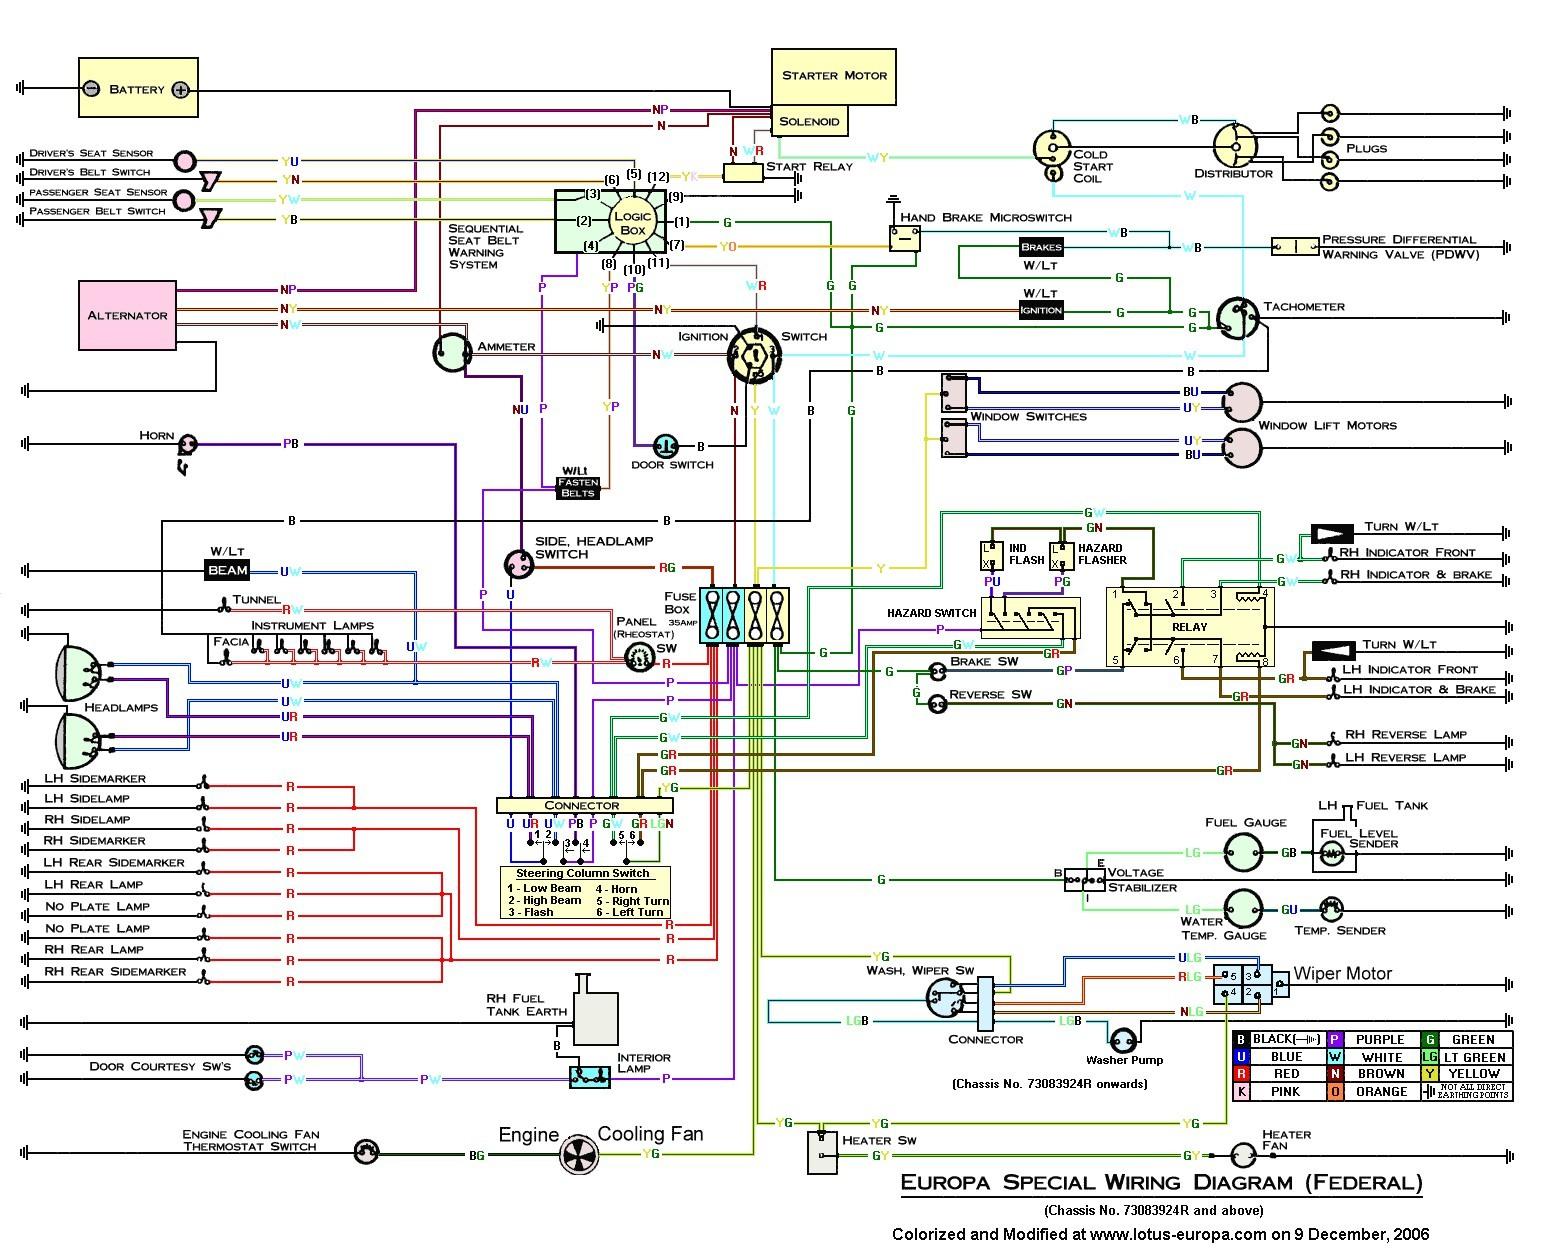 [SCHEMATICS_48ZD]  FM_6234] Wiring Diagrams Jvc Car Stereo Wiring Diagram File Name Jvc Stereo  Download Diagram | Jvc Kw Wiring Diagram |  | Phot Ndine Aryon Hapolo Mohammedshrine Librar Wiring 101